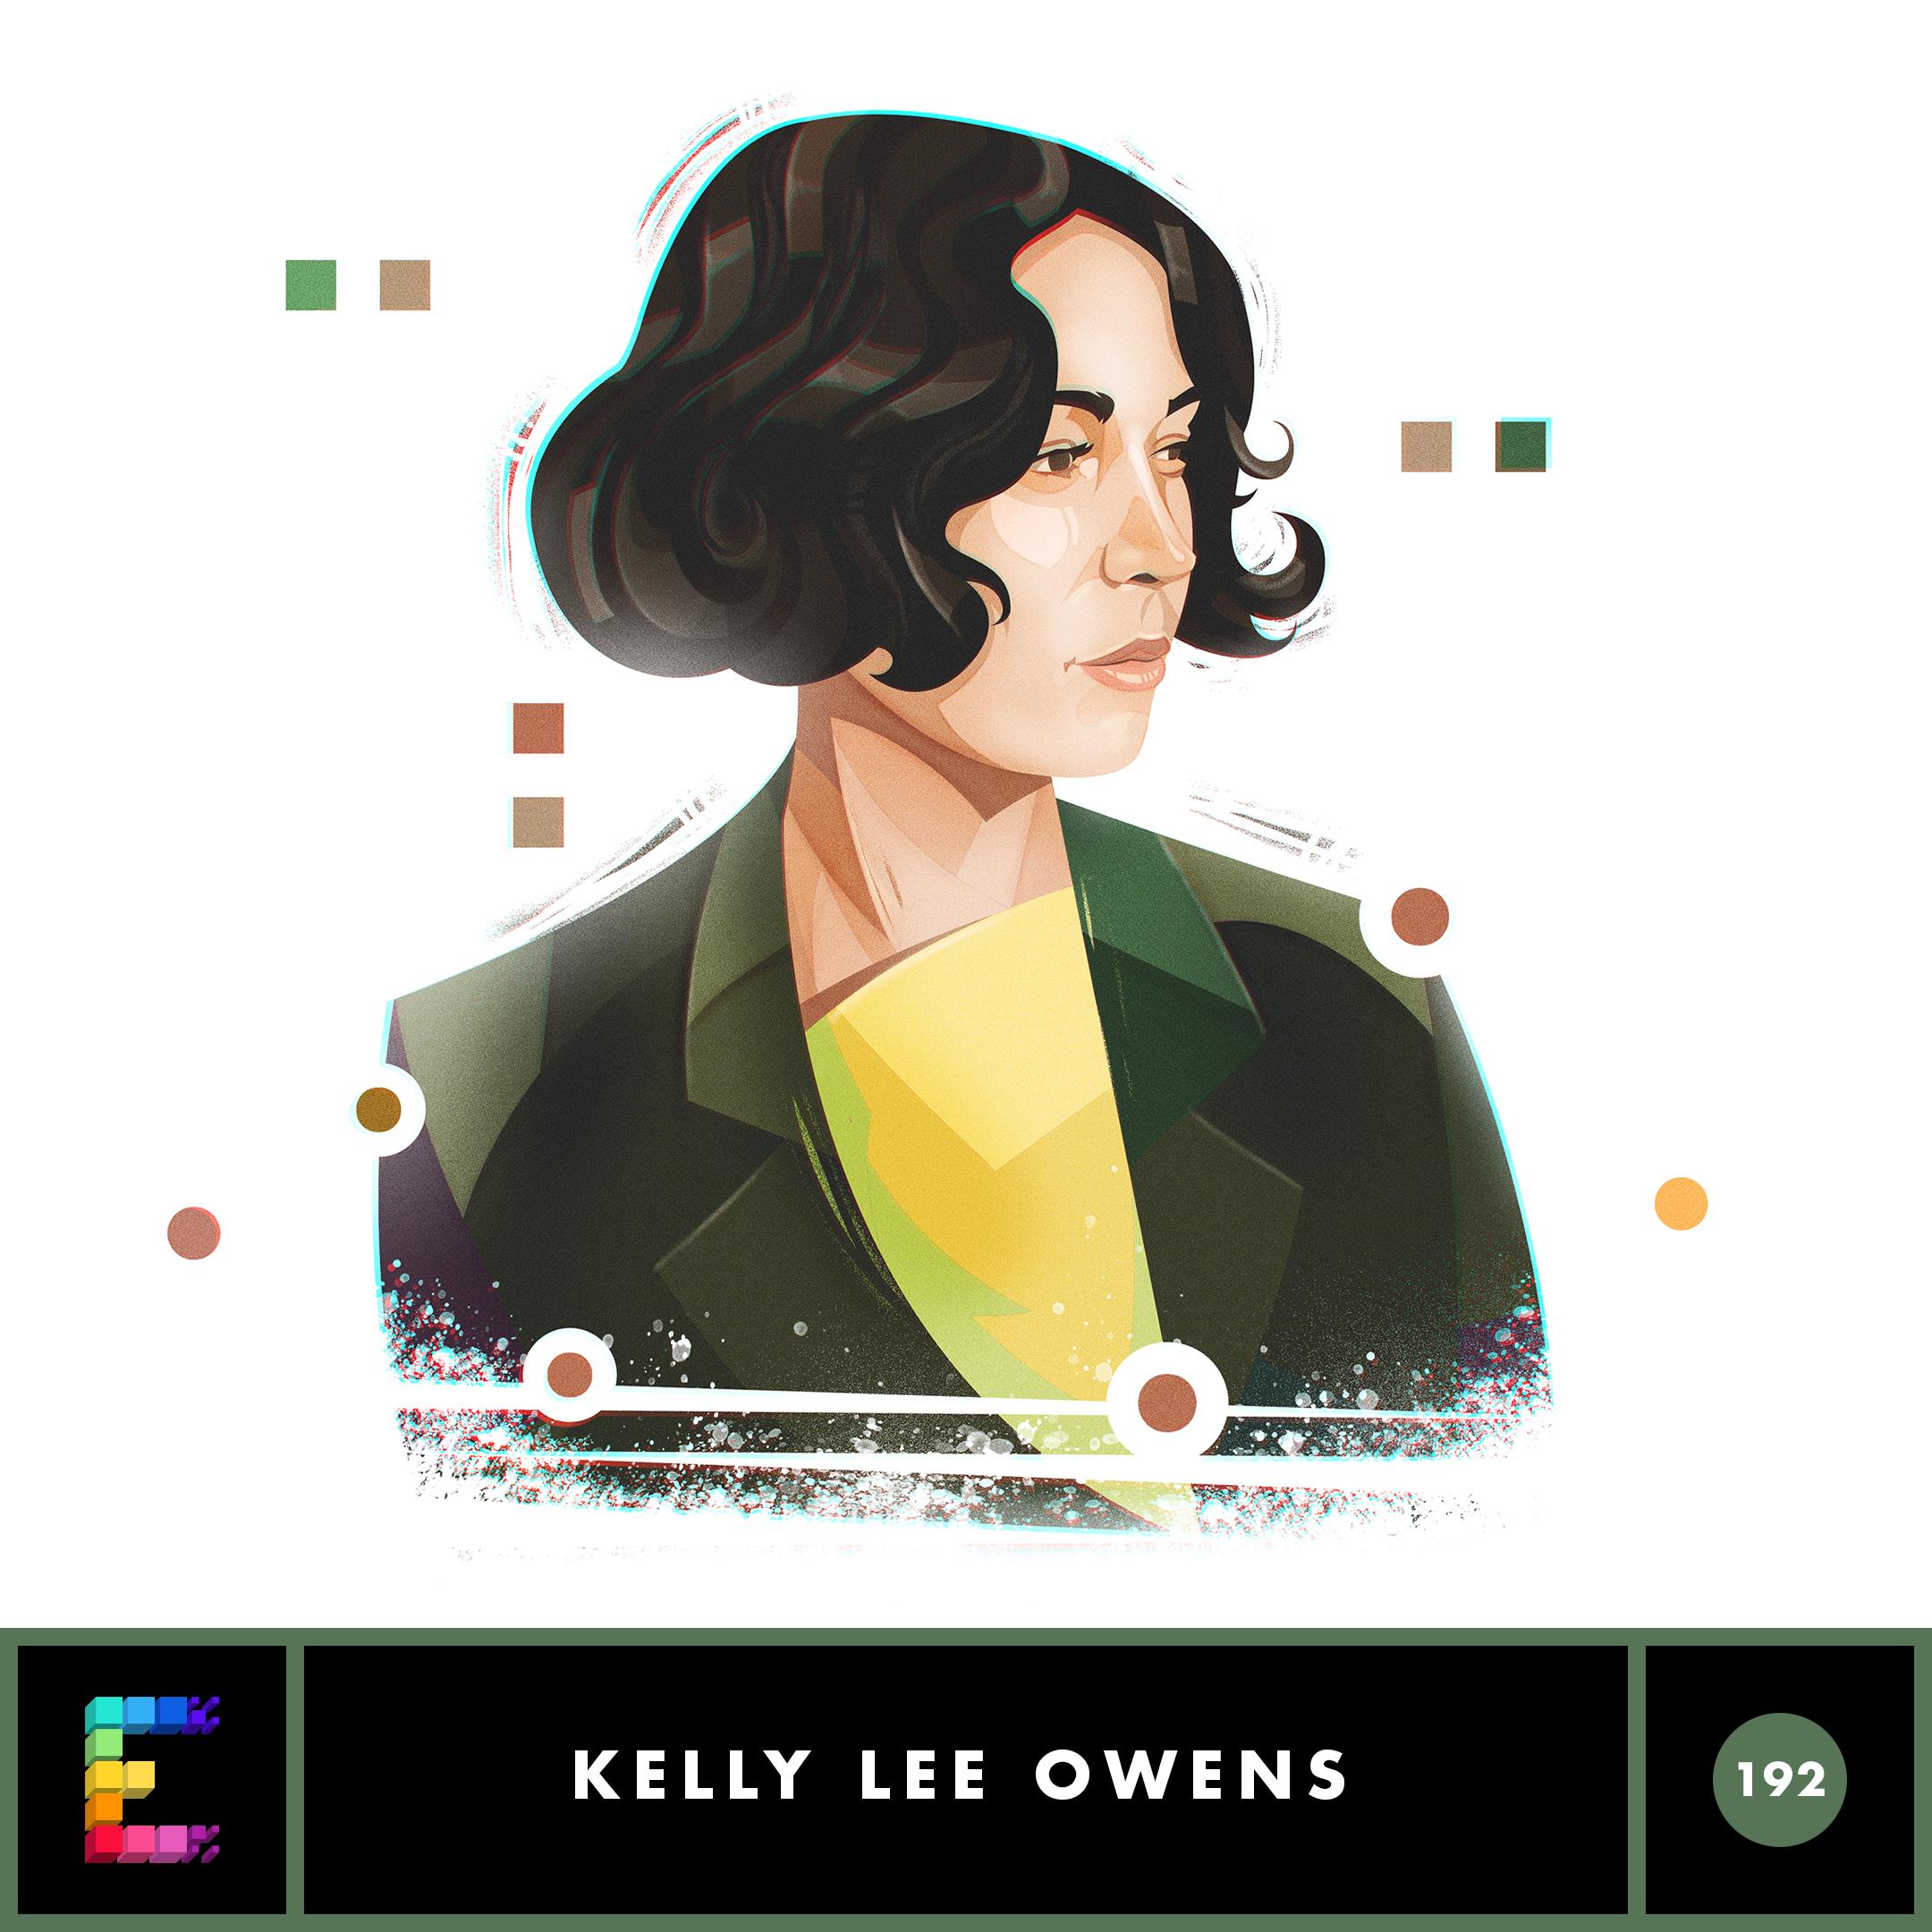 Kelly Lee Owens - On